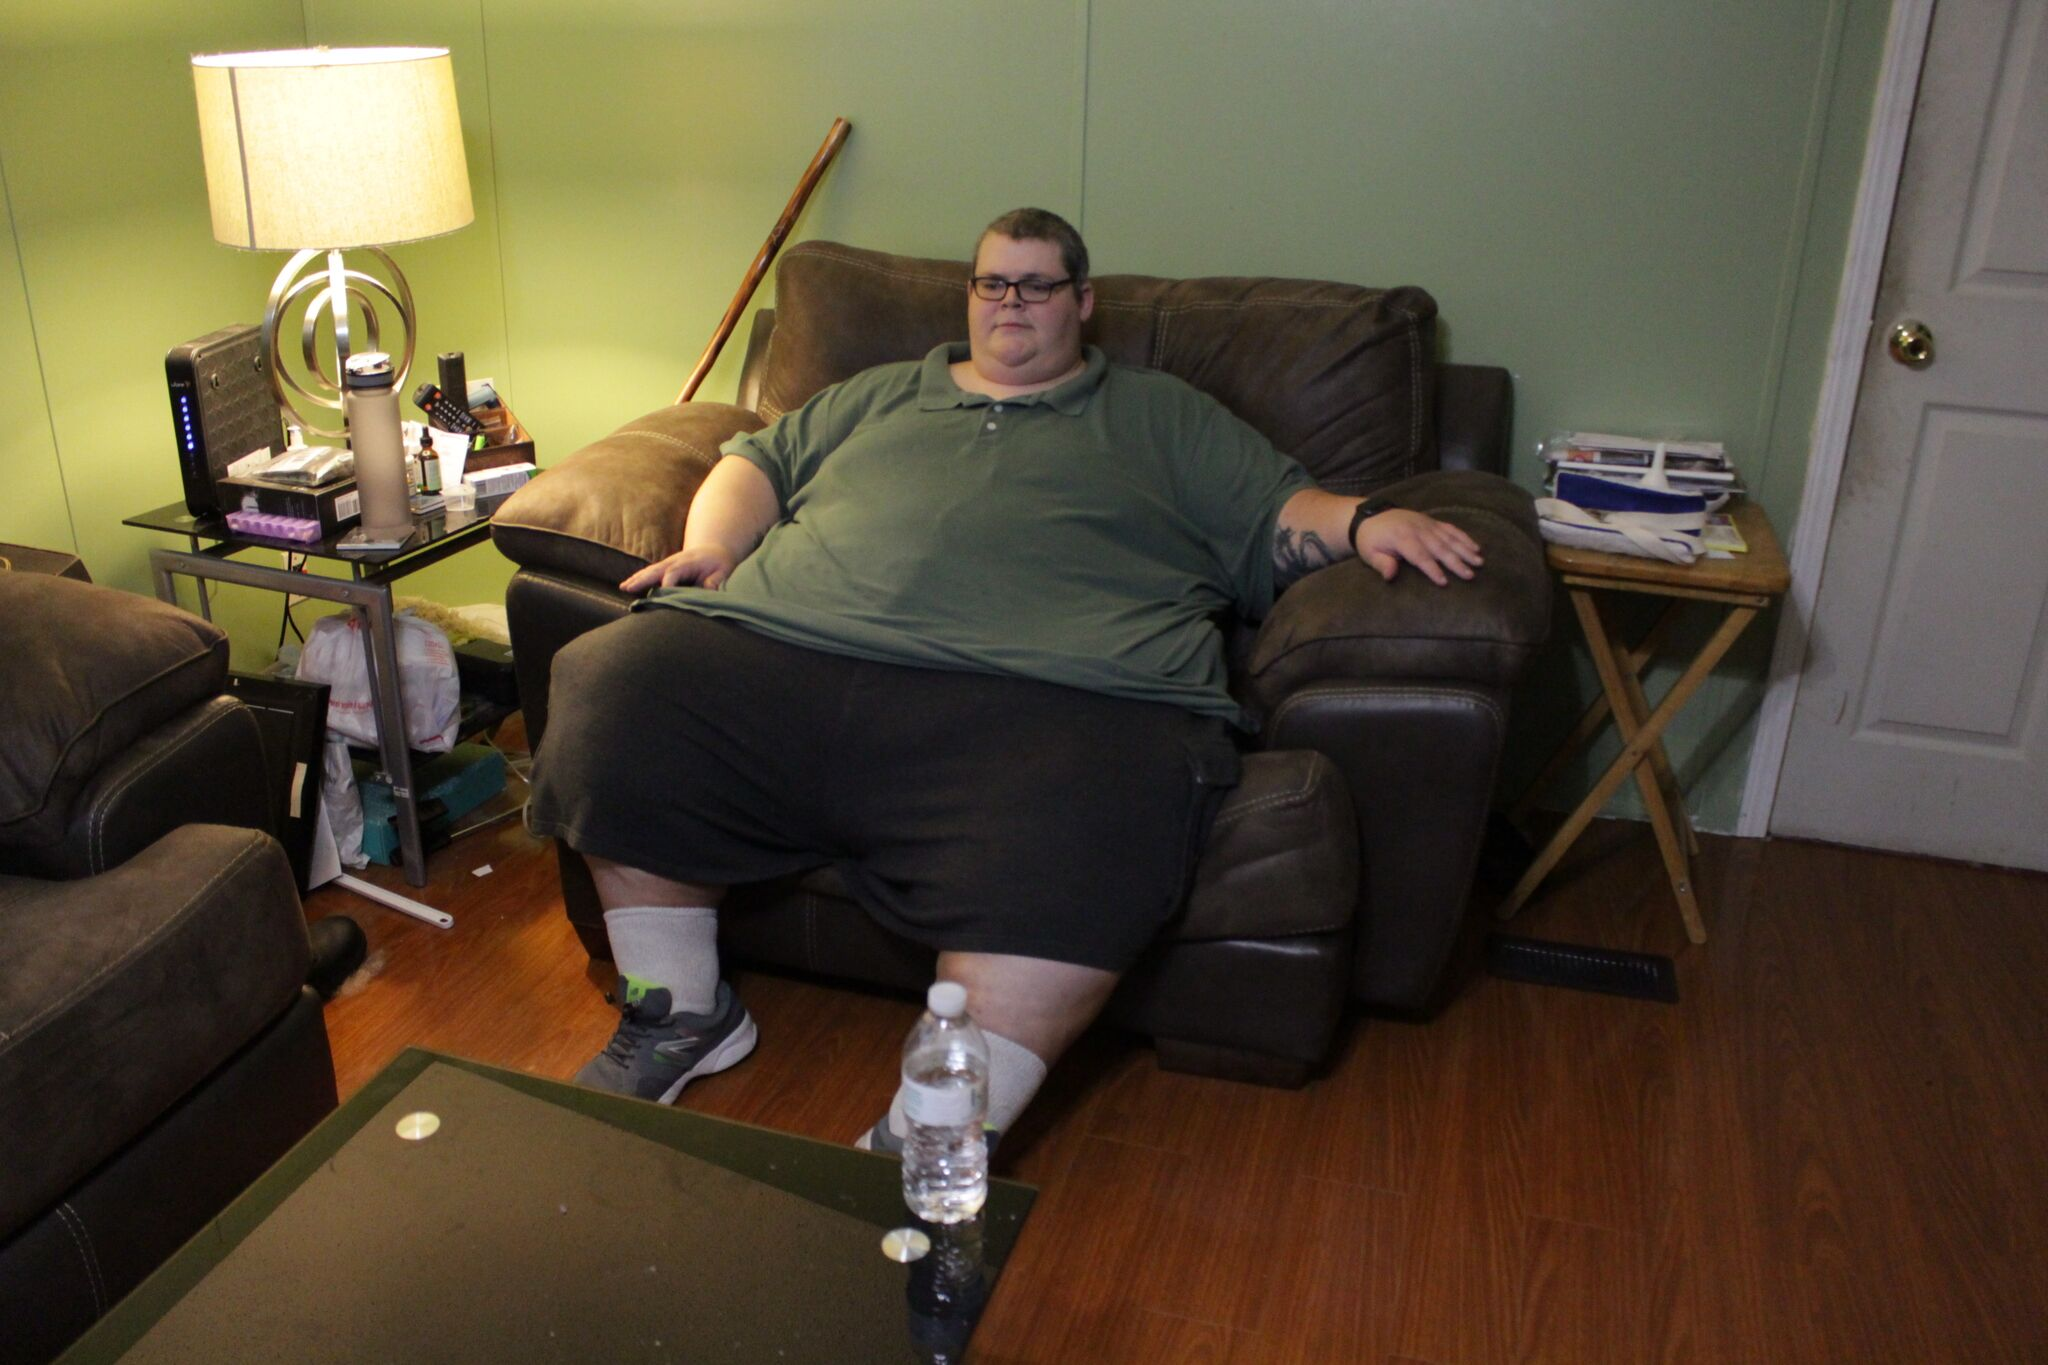 my 600 lb life season 5 episode 13 part 2